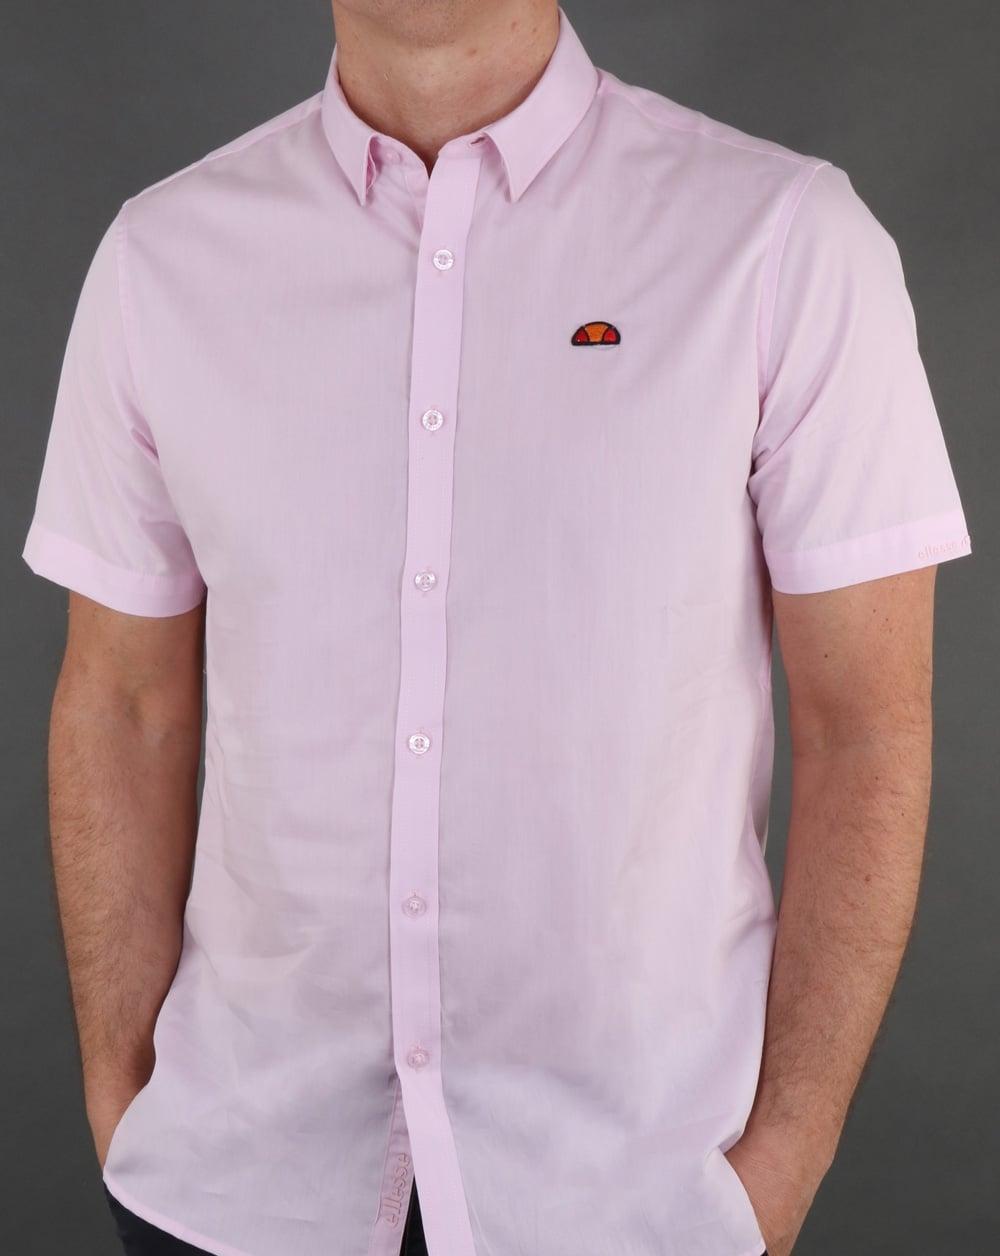 ee1a2883d5bf Pastel Pink Mens Dress Shirt - BCD Tofu House